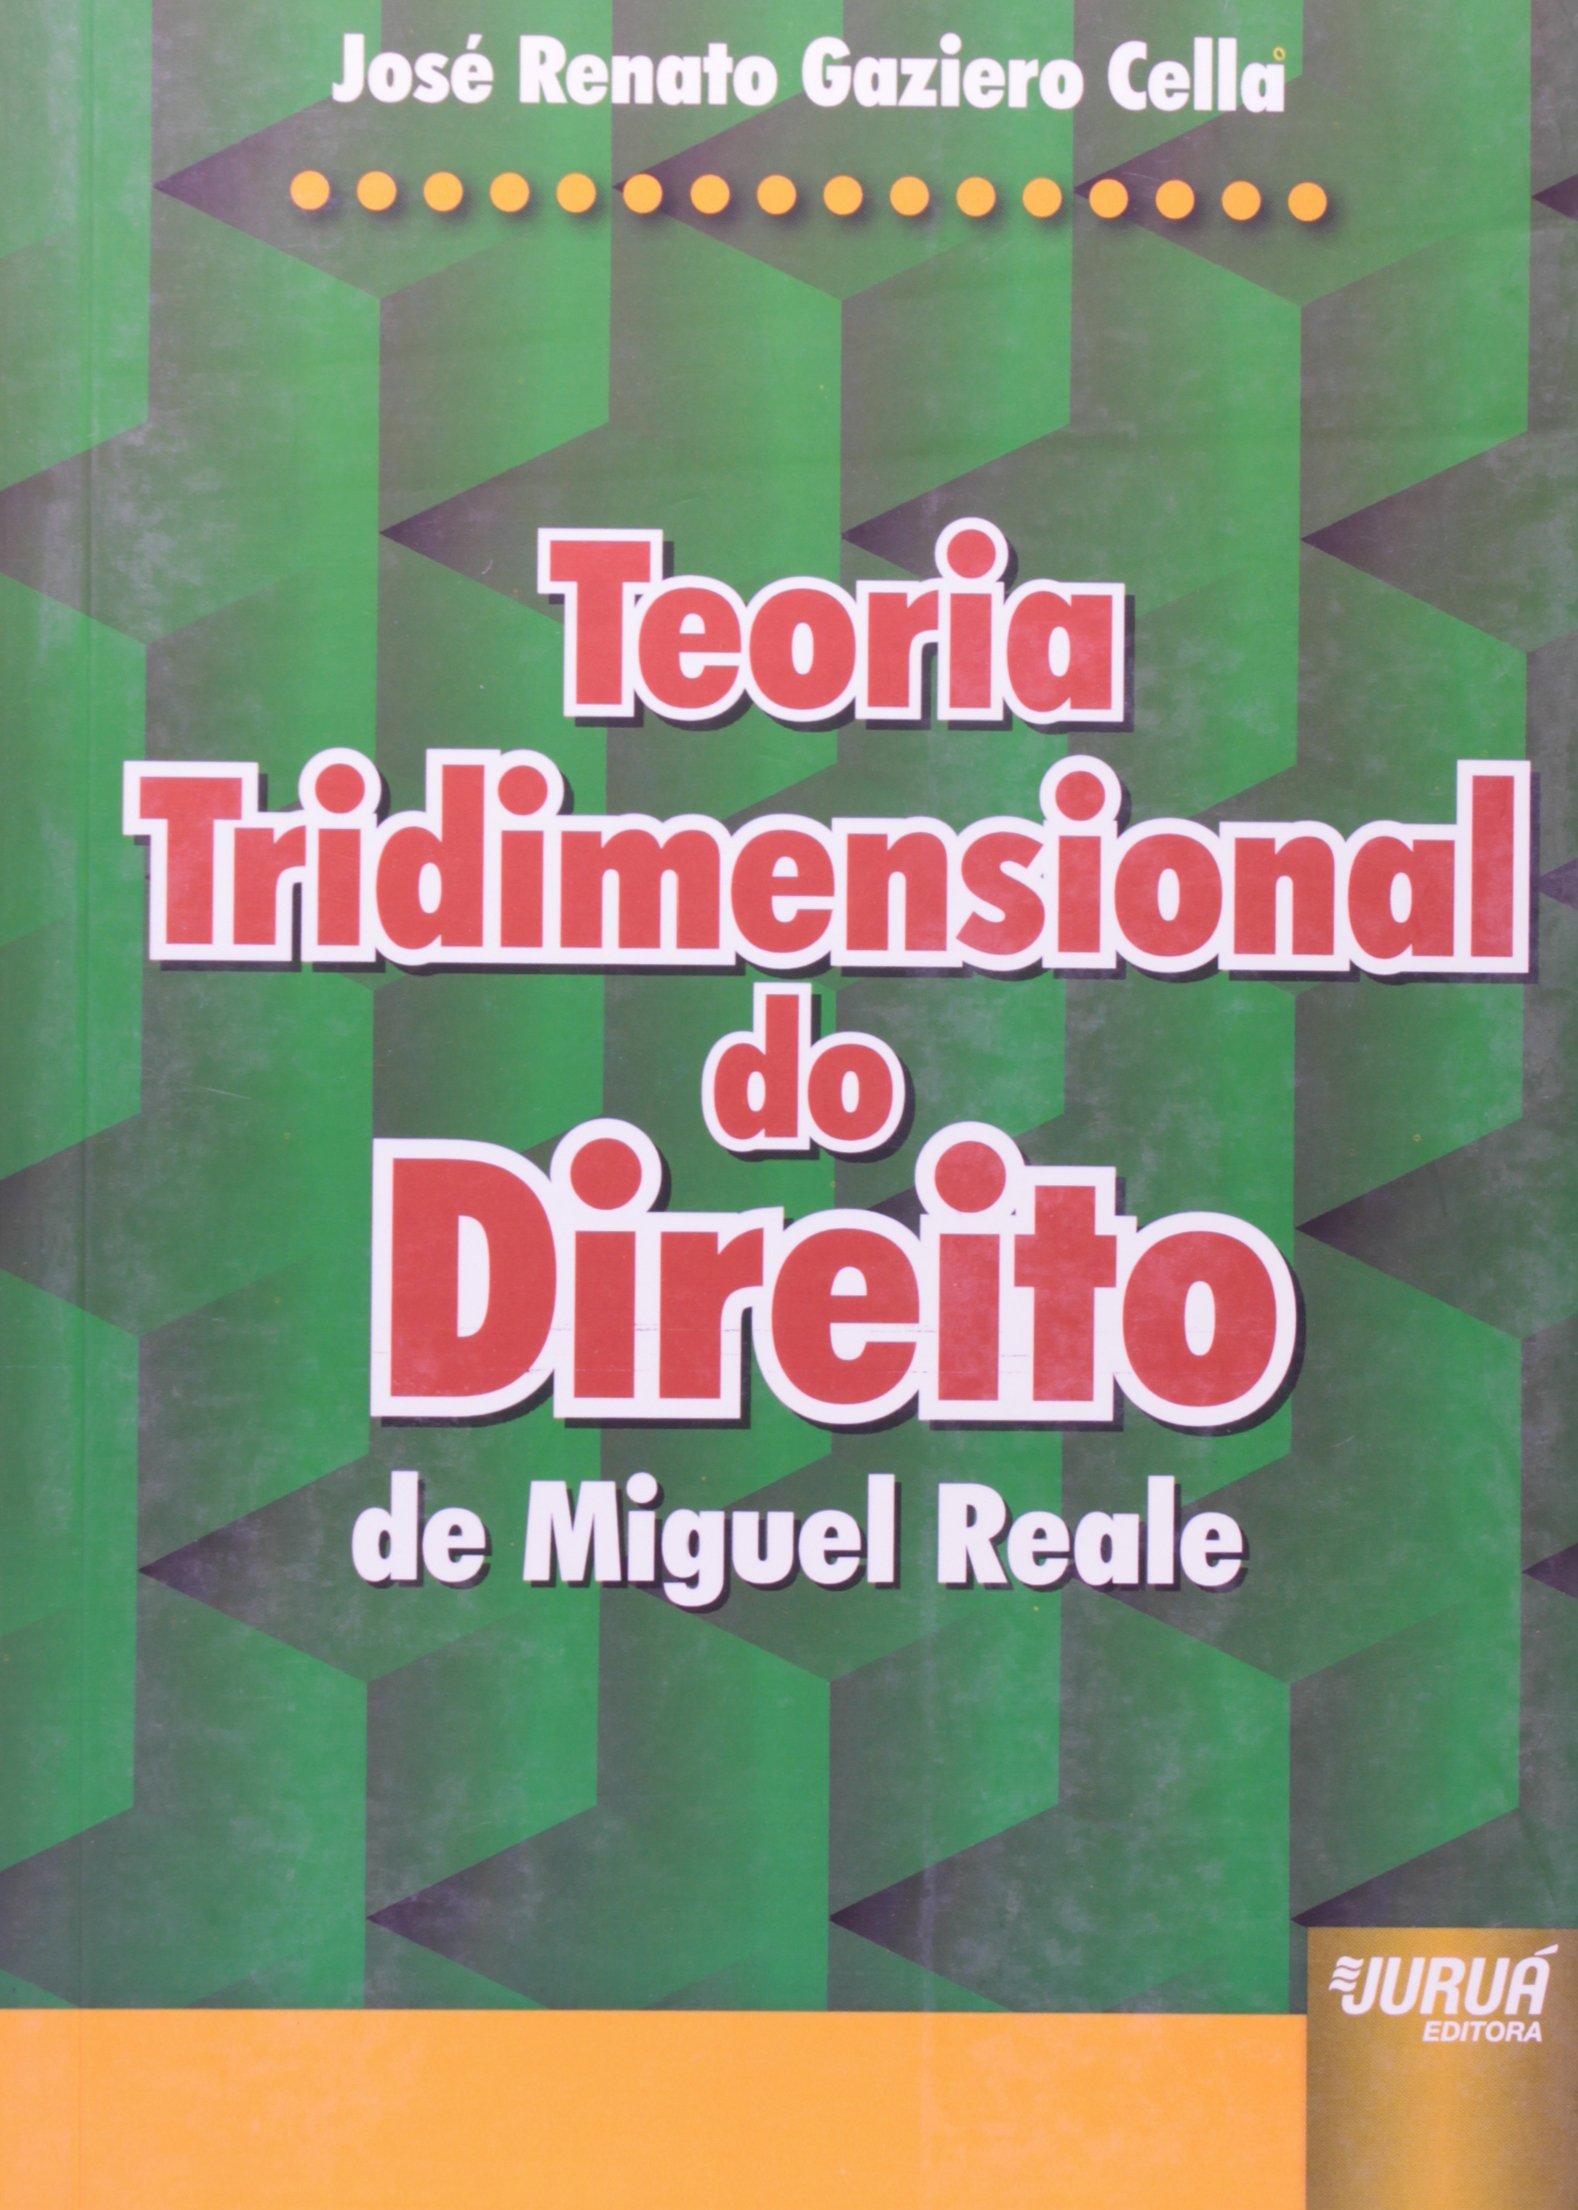 TRIDIMENSIONAL REALE DIREITO TEORIA MIGUEL DO DE BAIXAR